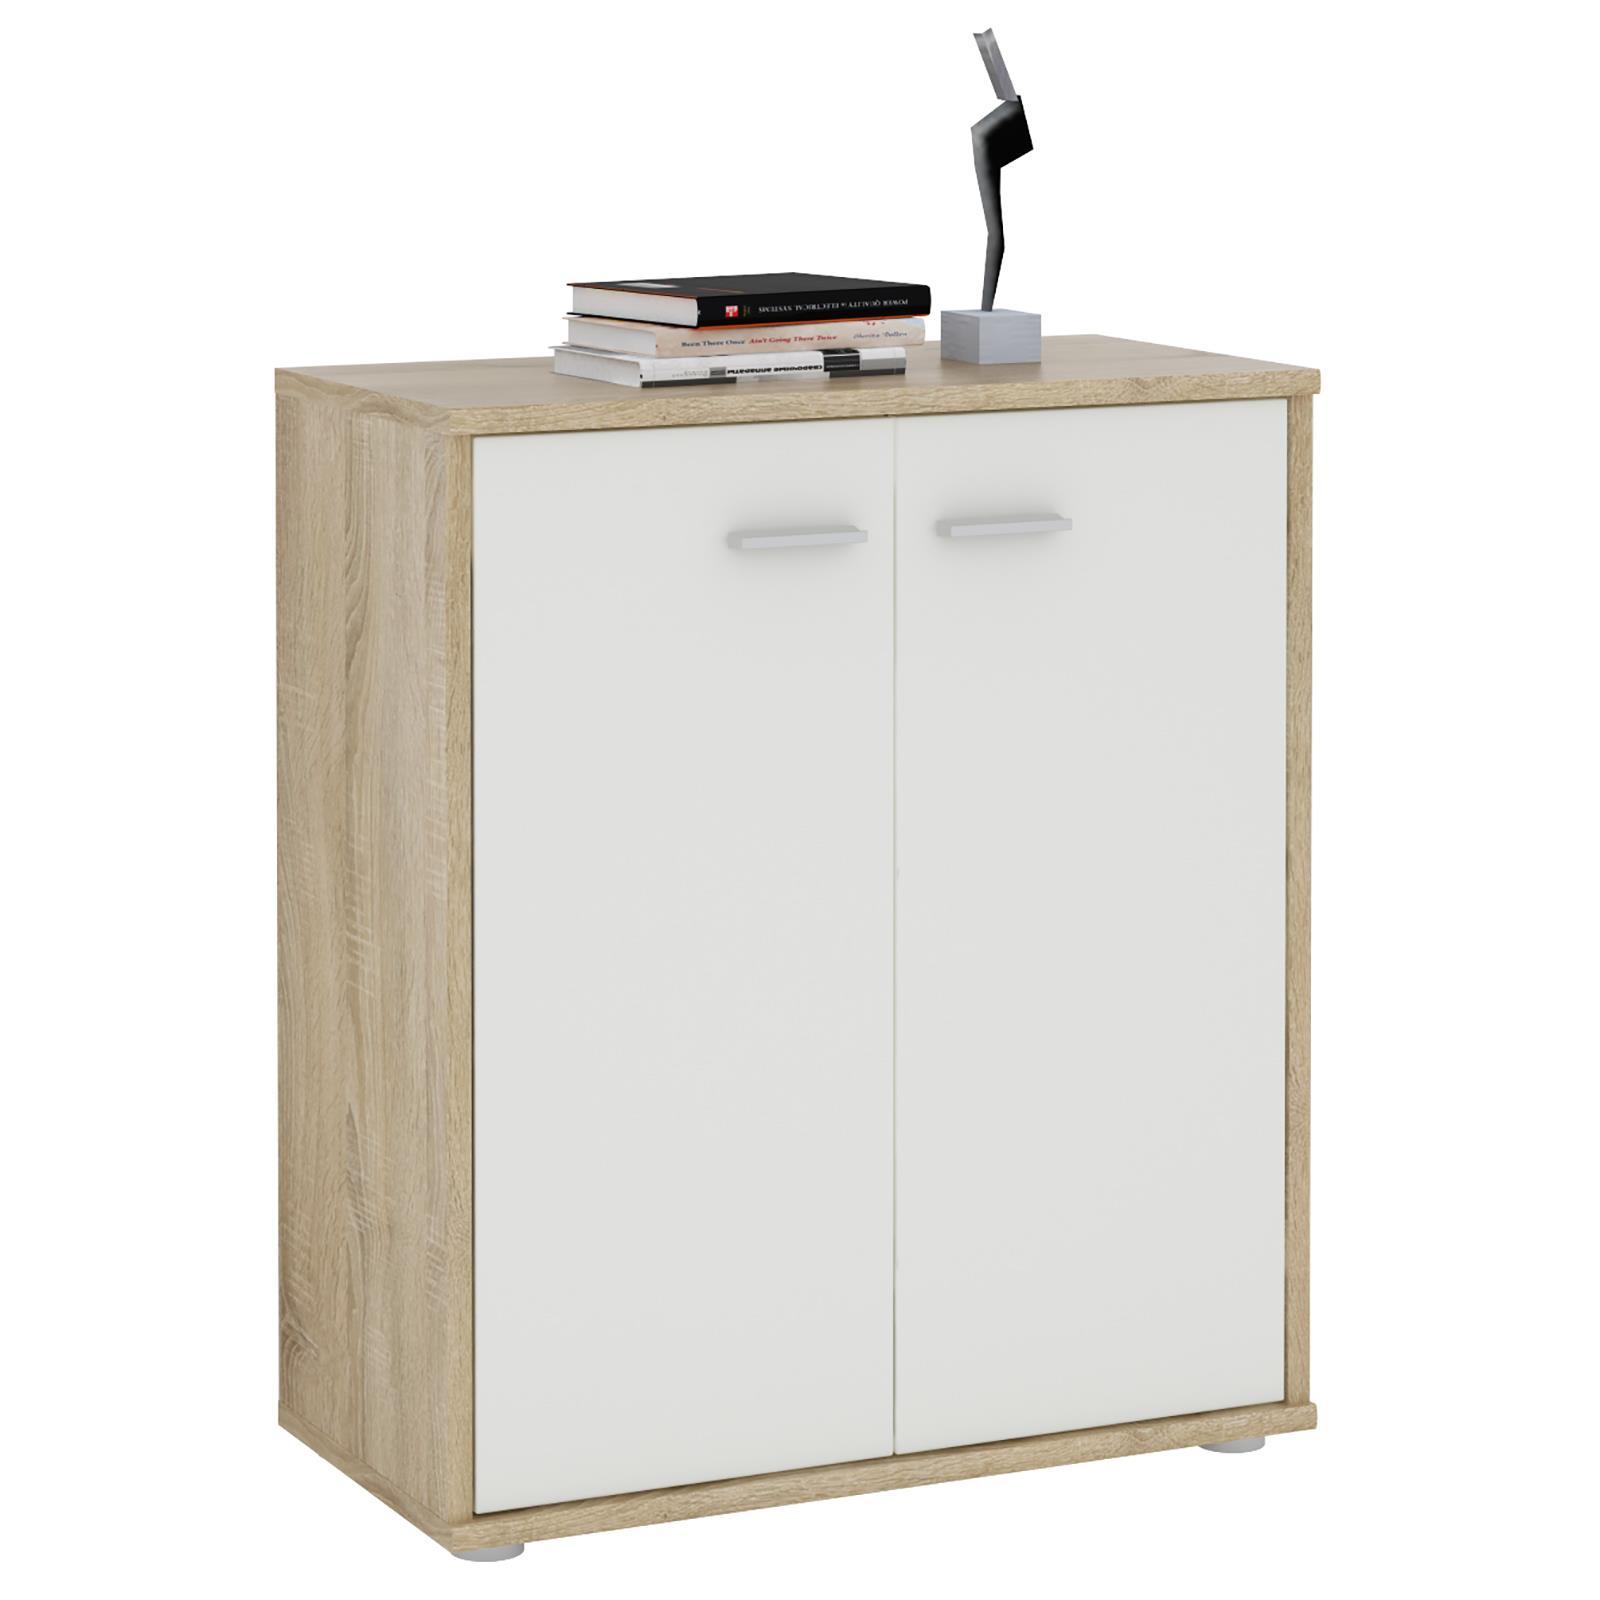 kommode tommy in sonoma eiche wei 2 t ren caro m bel. Black Bedroom Furniture Sets. Home Design Ideas